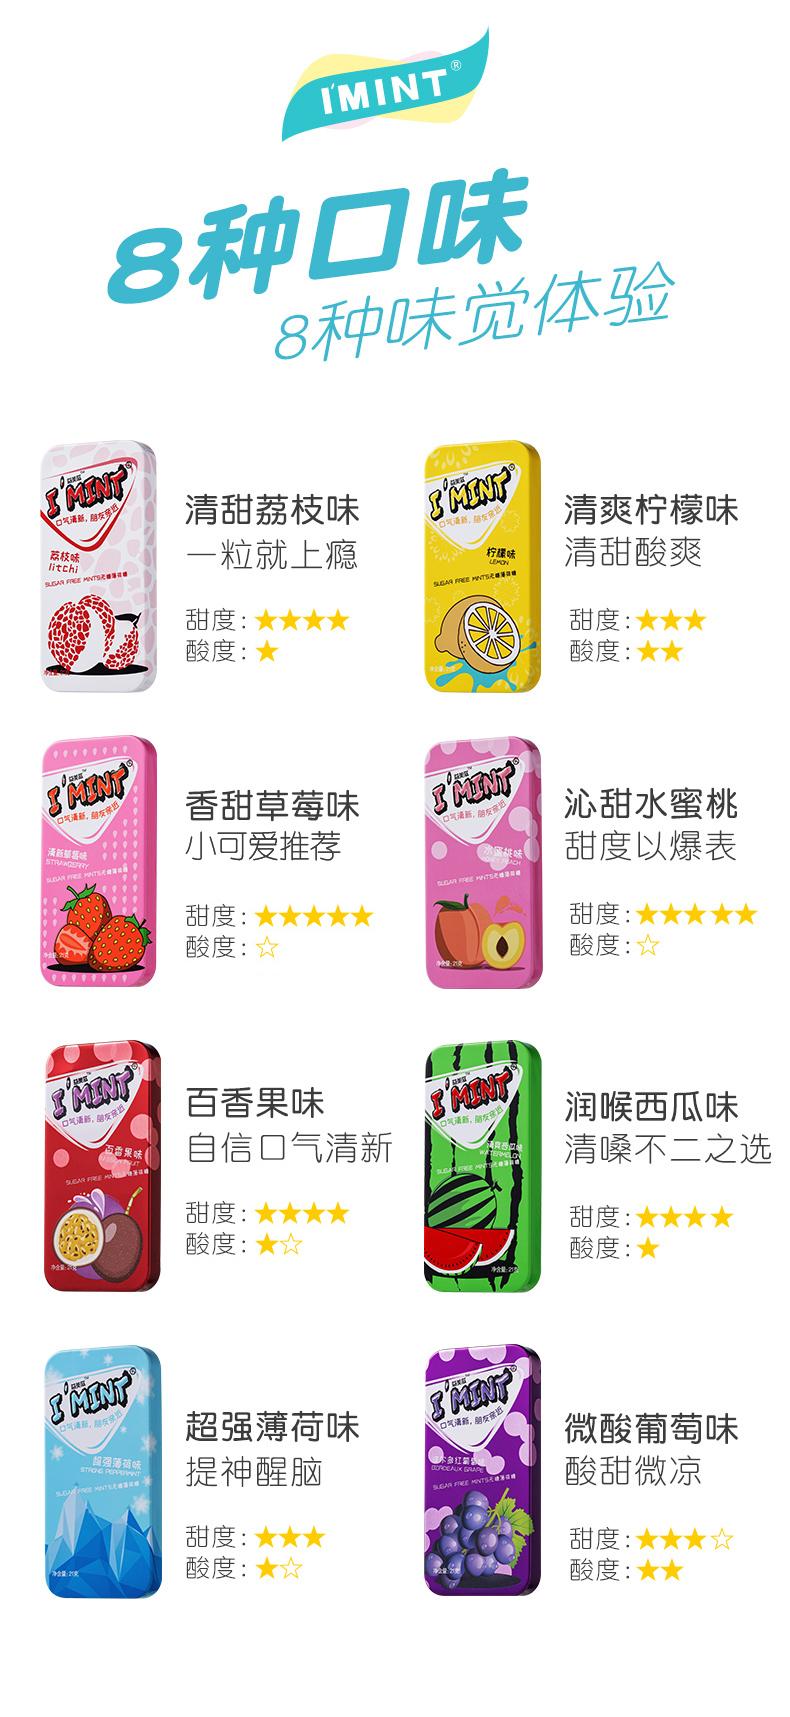 IMINT_网红无糖薄荷糖6盒